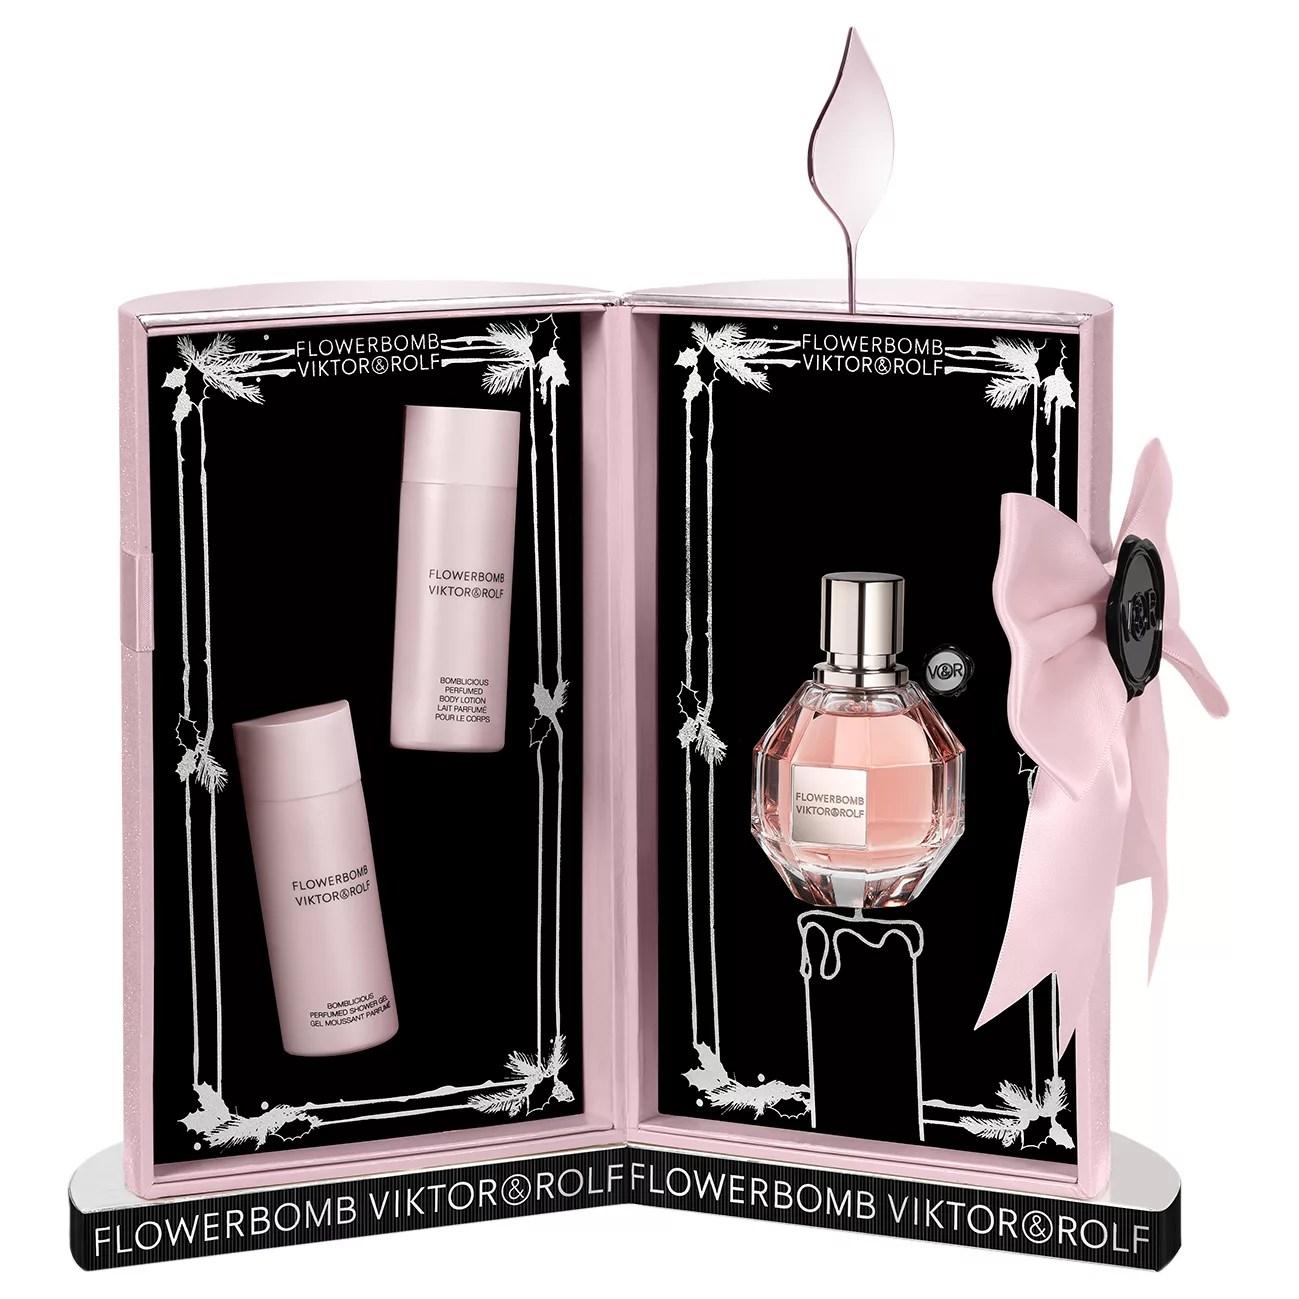 Viktor & Rolf Flowerbomb 50ml Eau De Parfum Fragrance